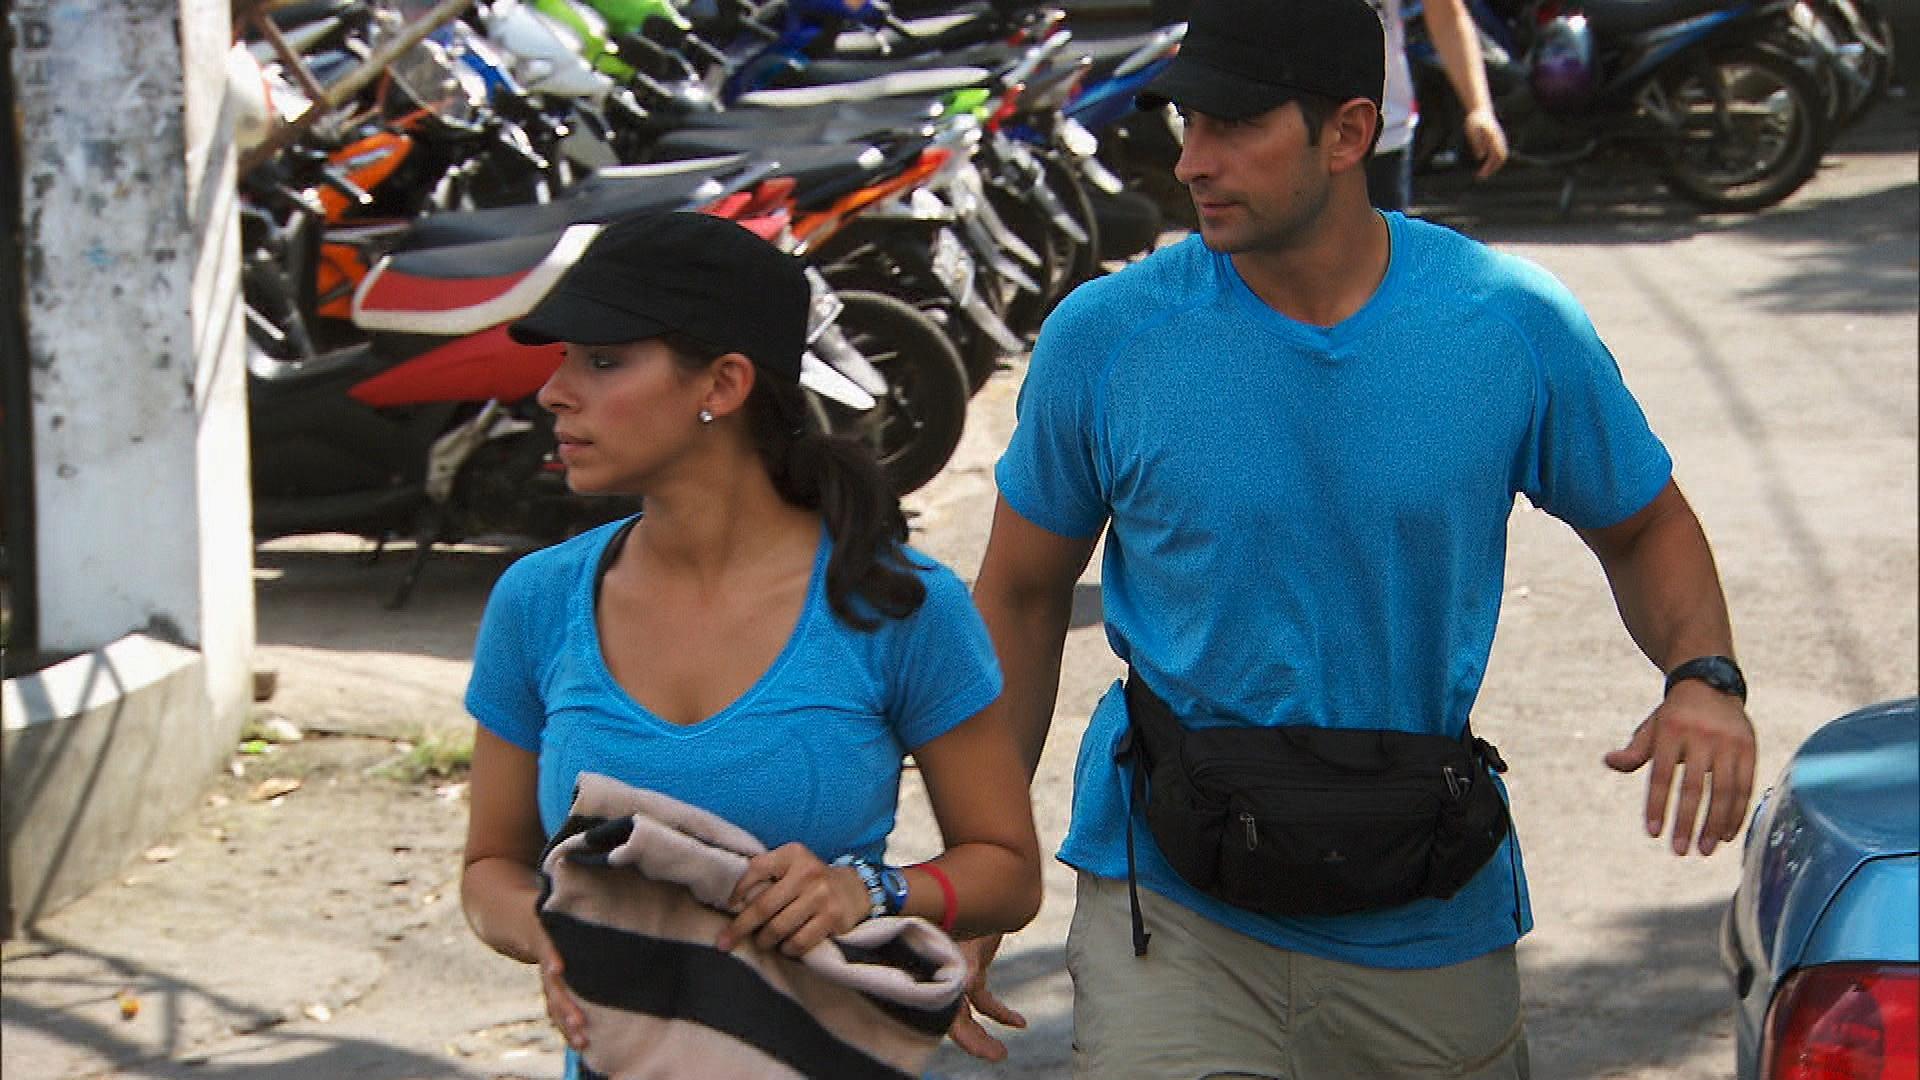 Racing through Bandung, Indonesia in Season 23 Episode 9